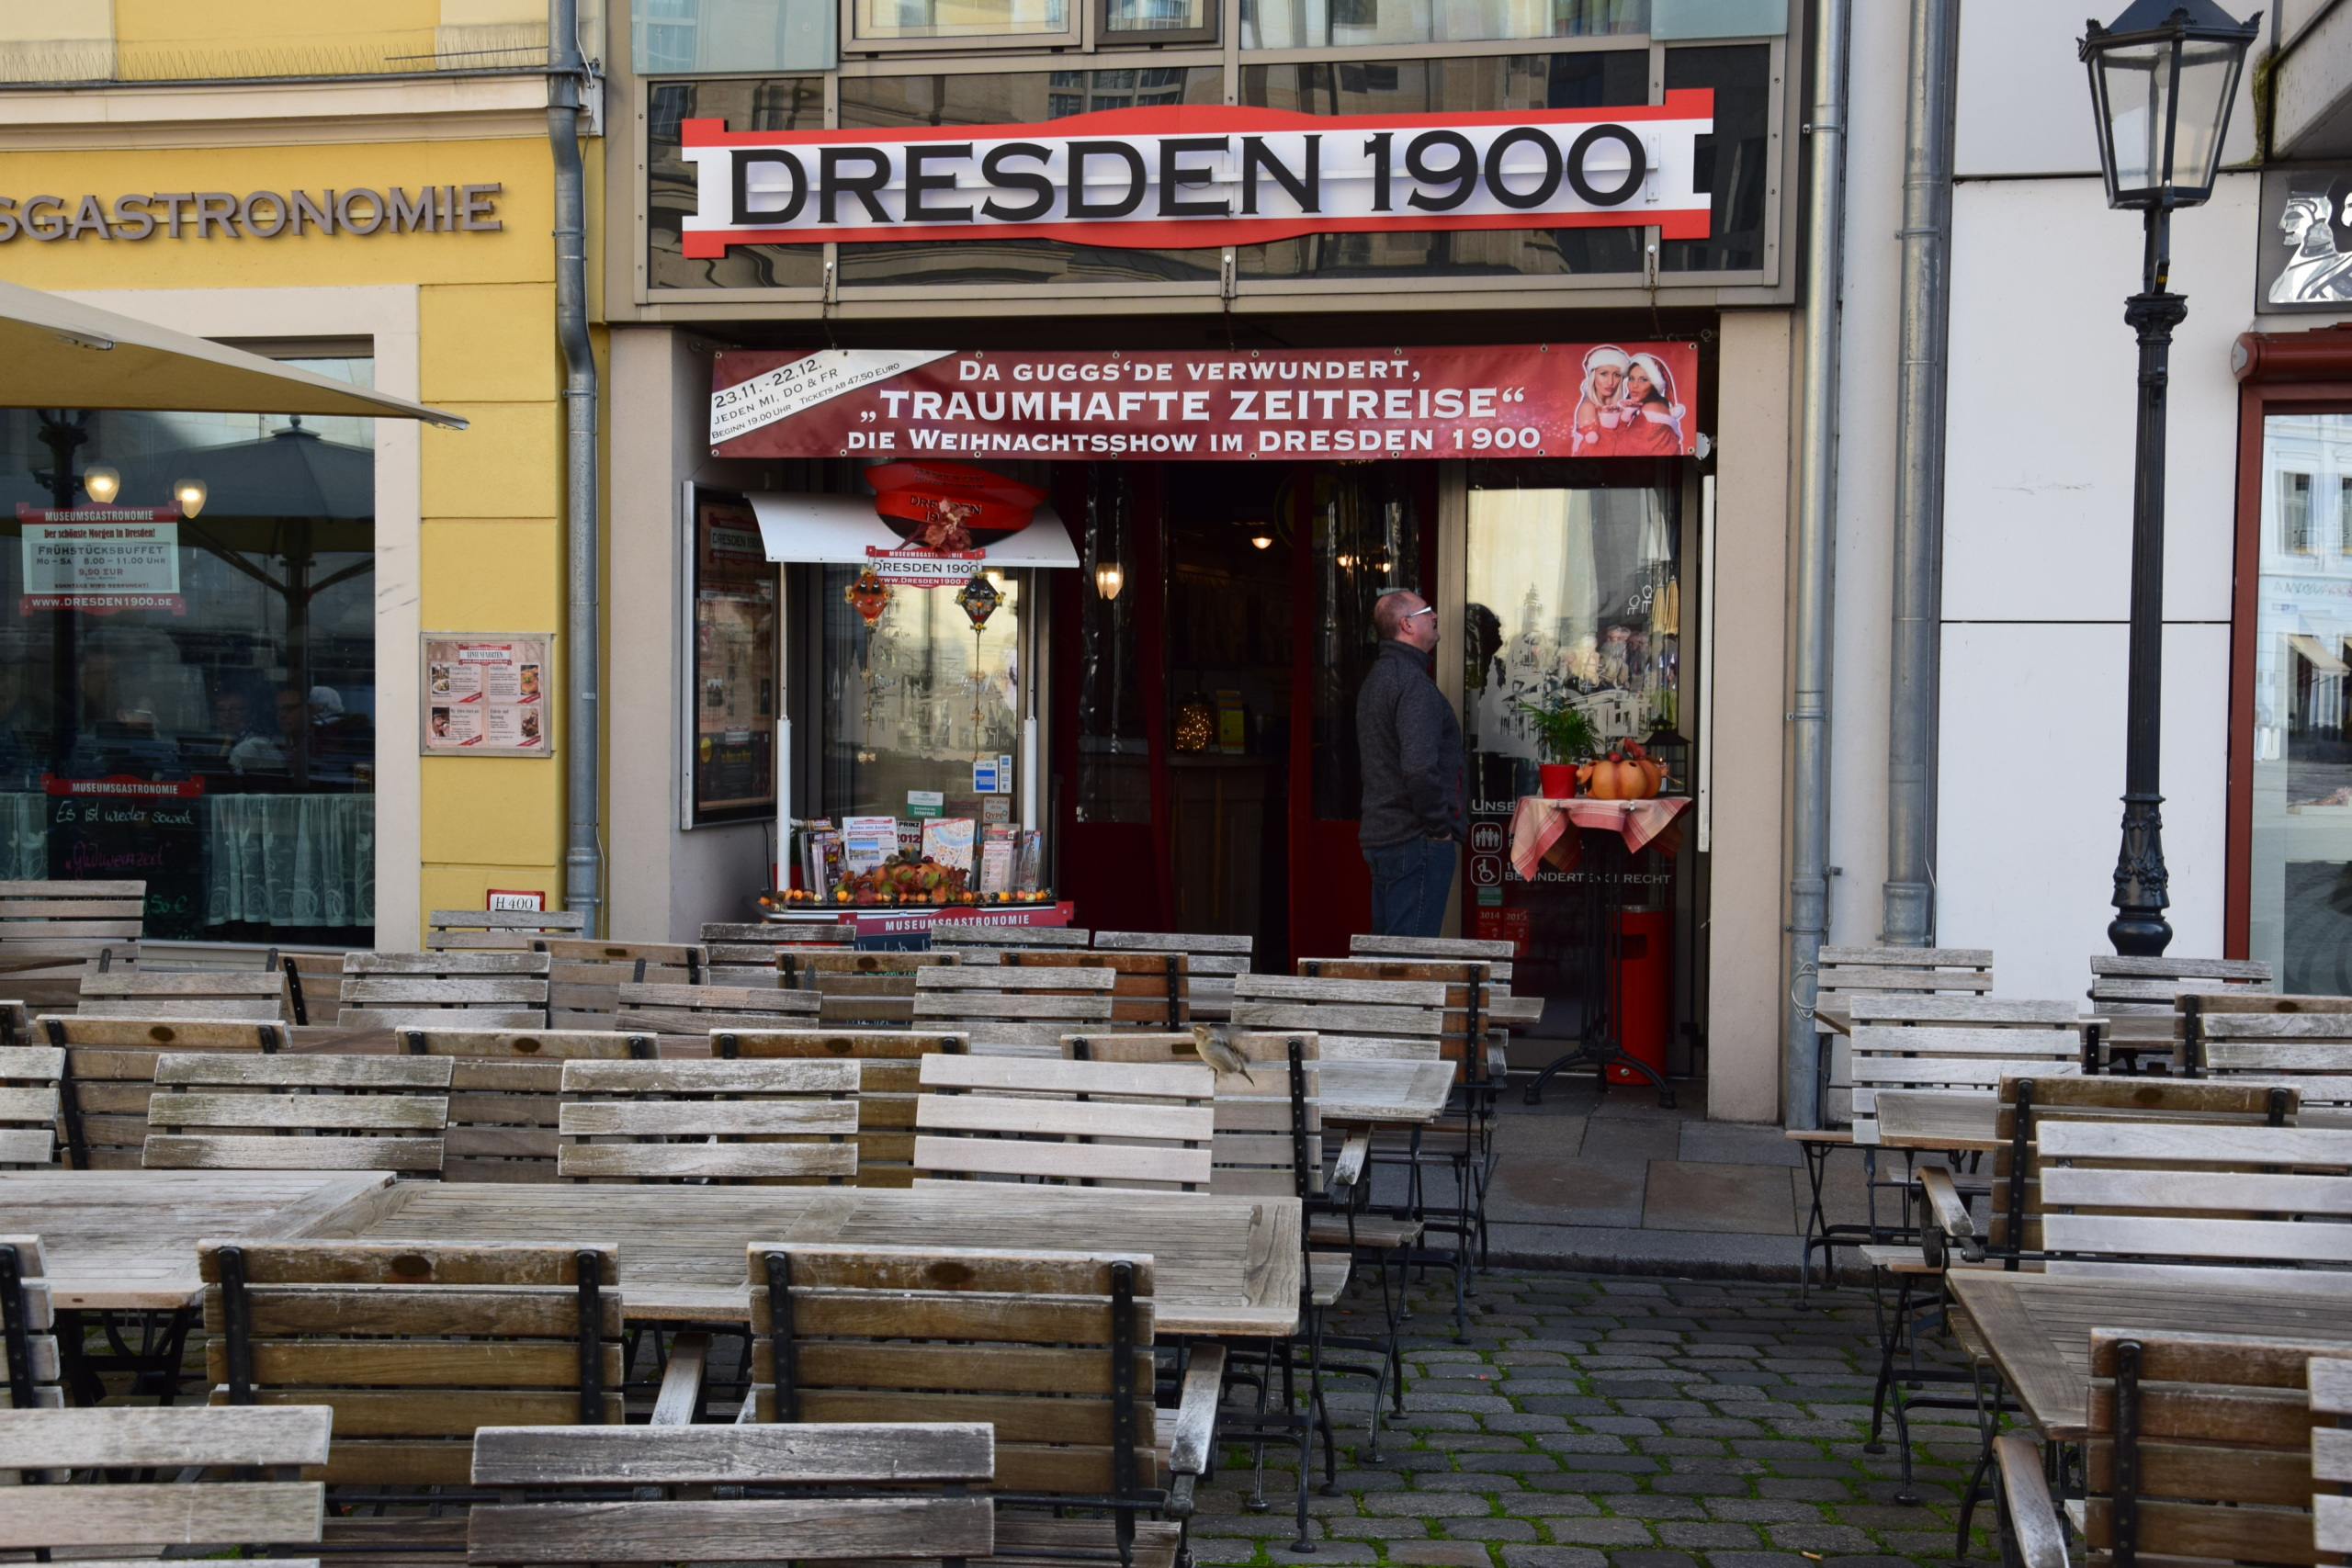 Dresden 1900 Öffnungszeiten, An der Frauenkirche in Dresden | Offen.net